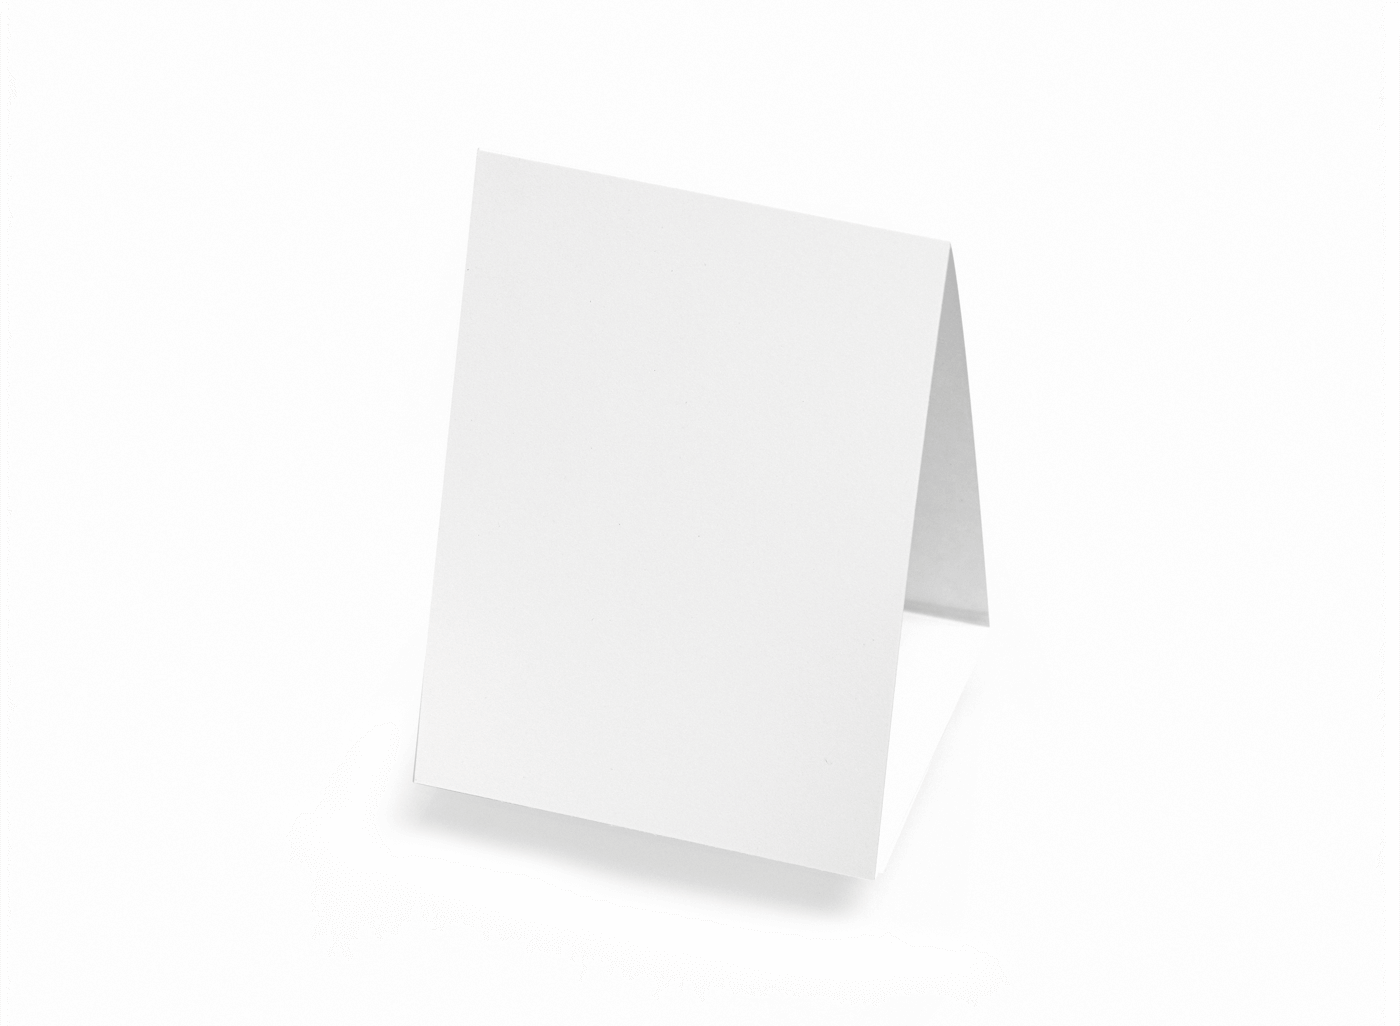 Blanks/USA Lift Off™ Die Cuts